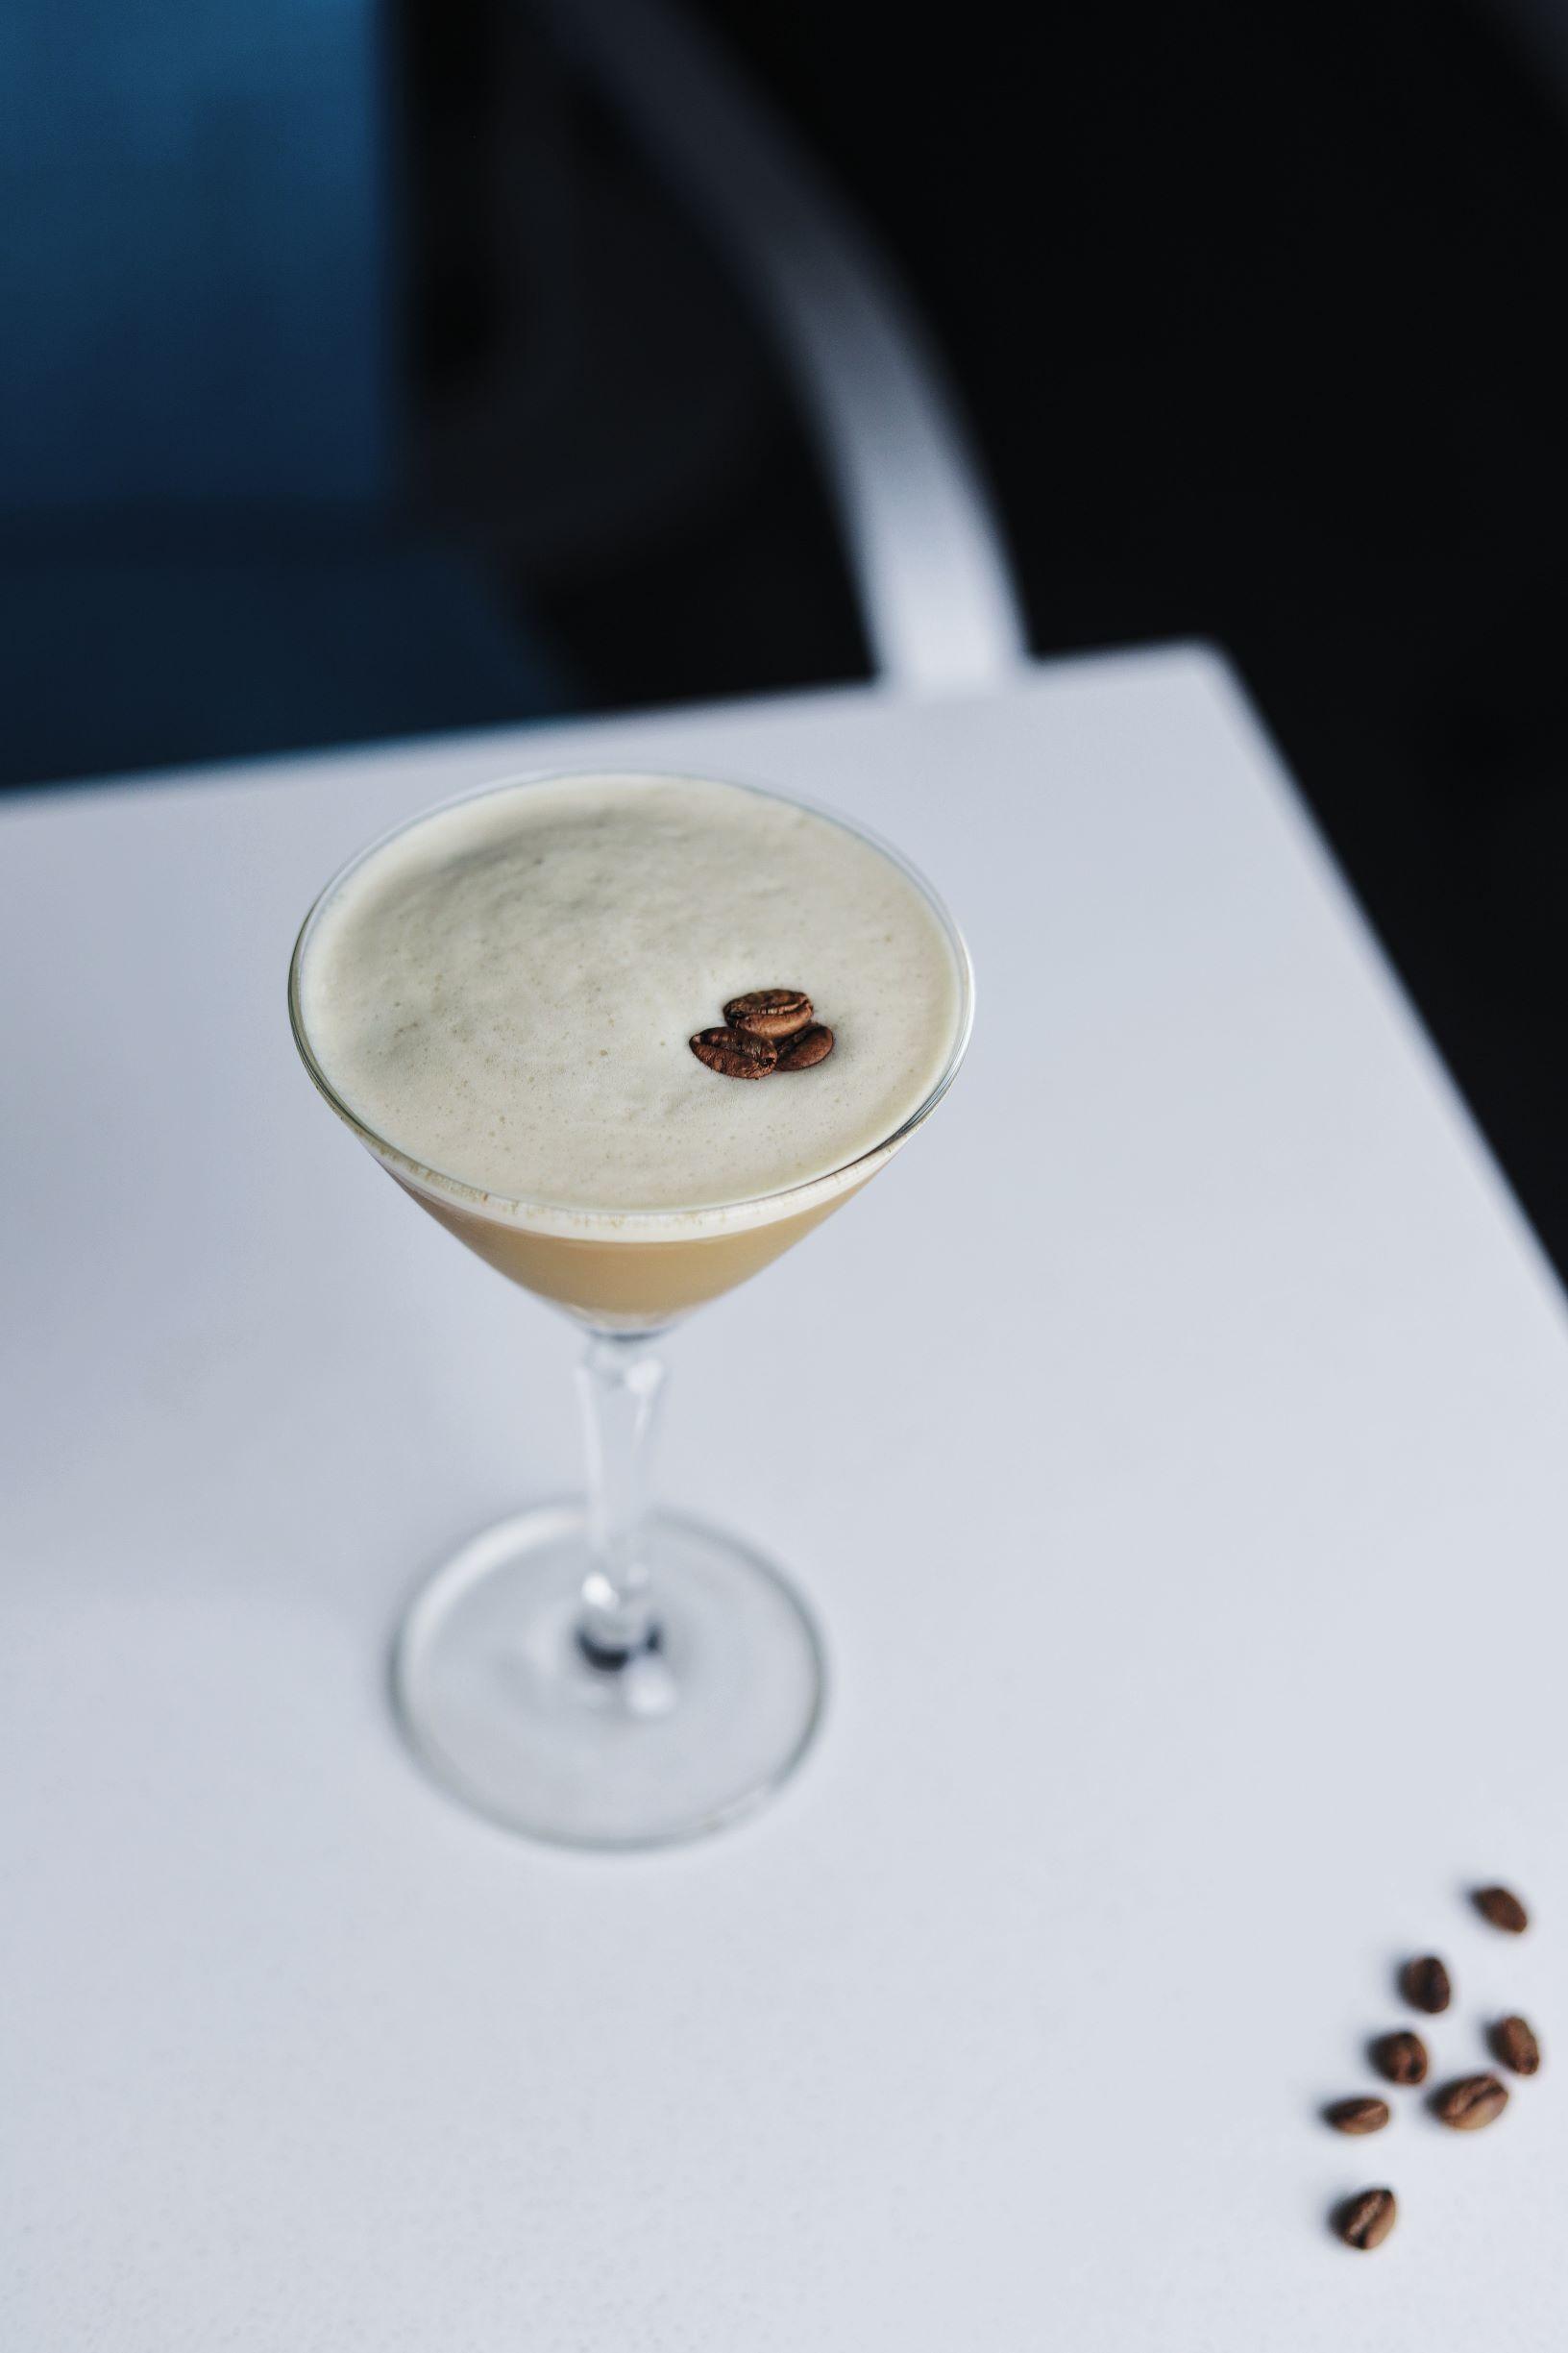 LeClair Organics Liberica coffee bean, brandy espresso martini recipe, coffee cocktails 19